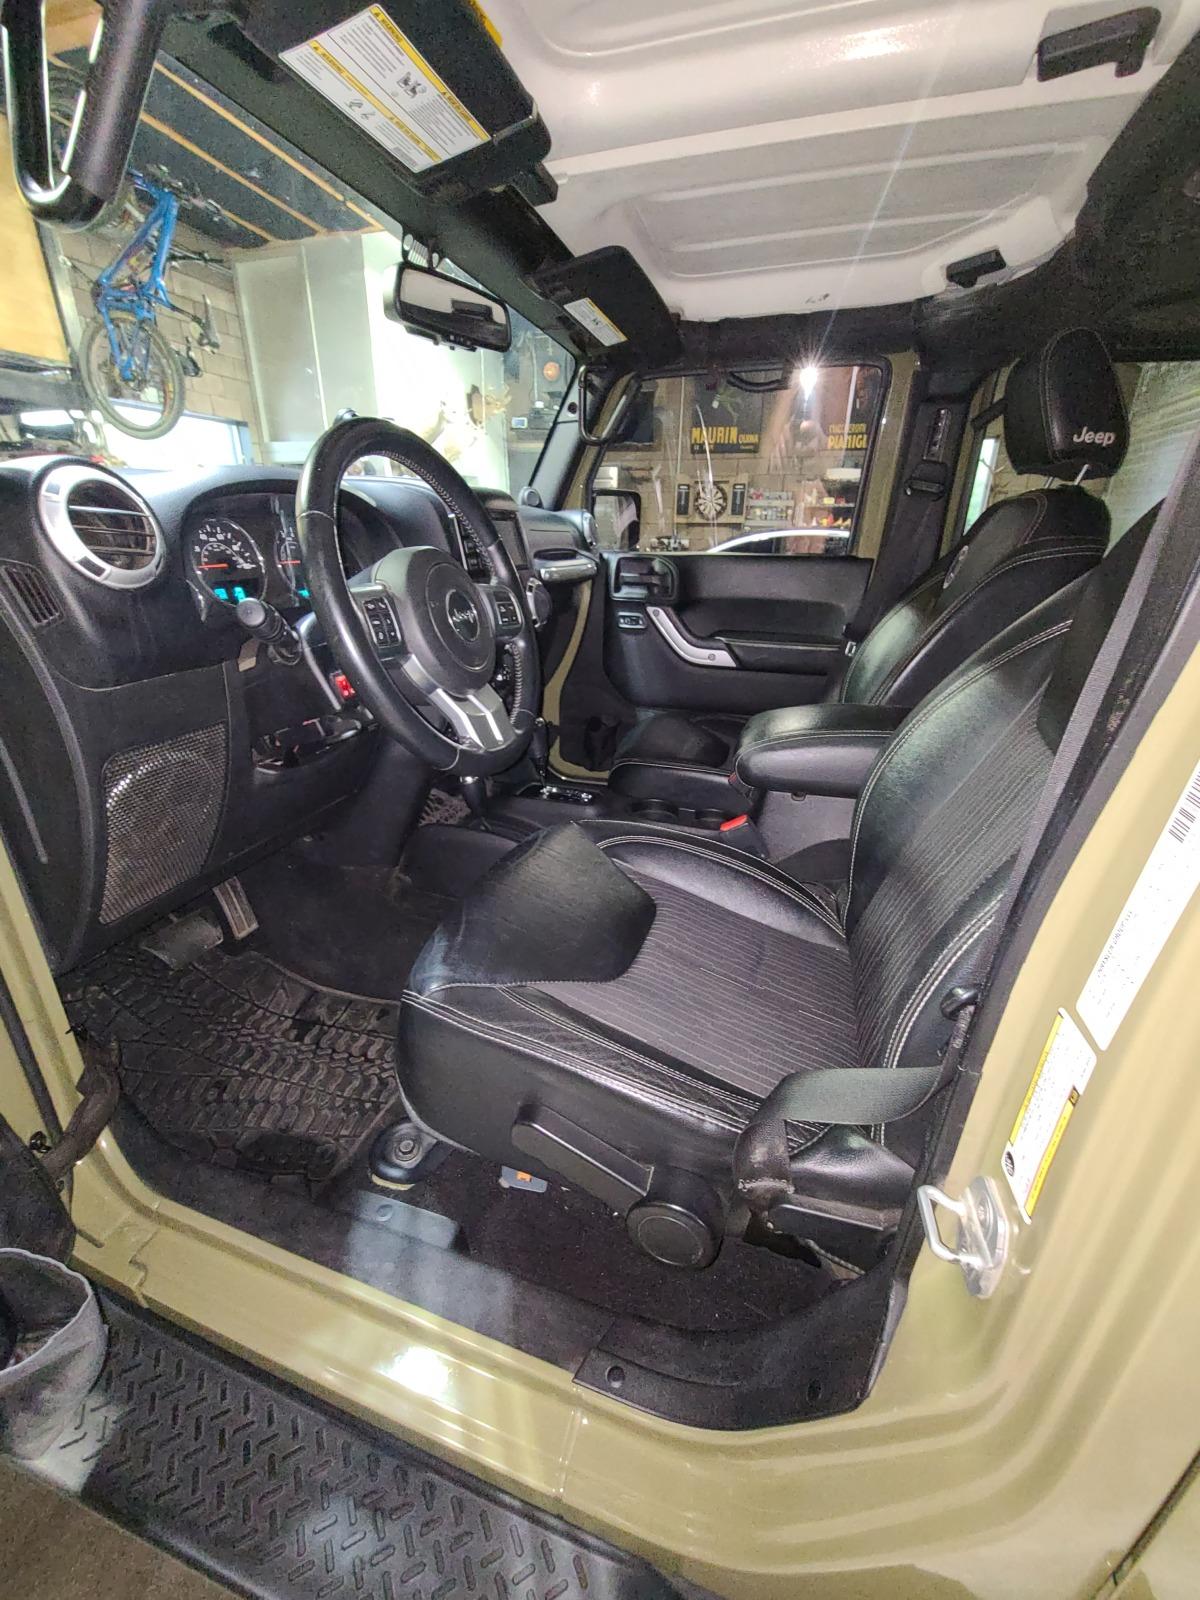 For Sale: 2013 jeep wrangler j/k oscar Mike freedom edition - photo5